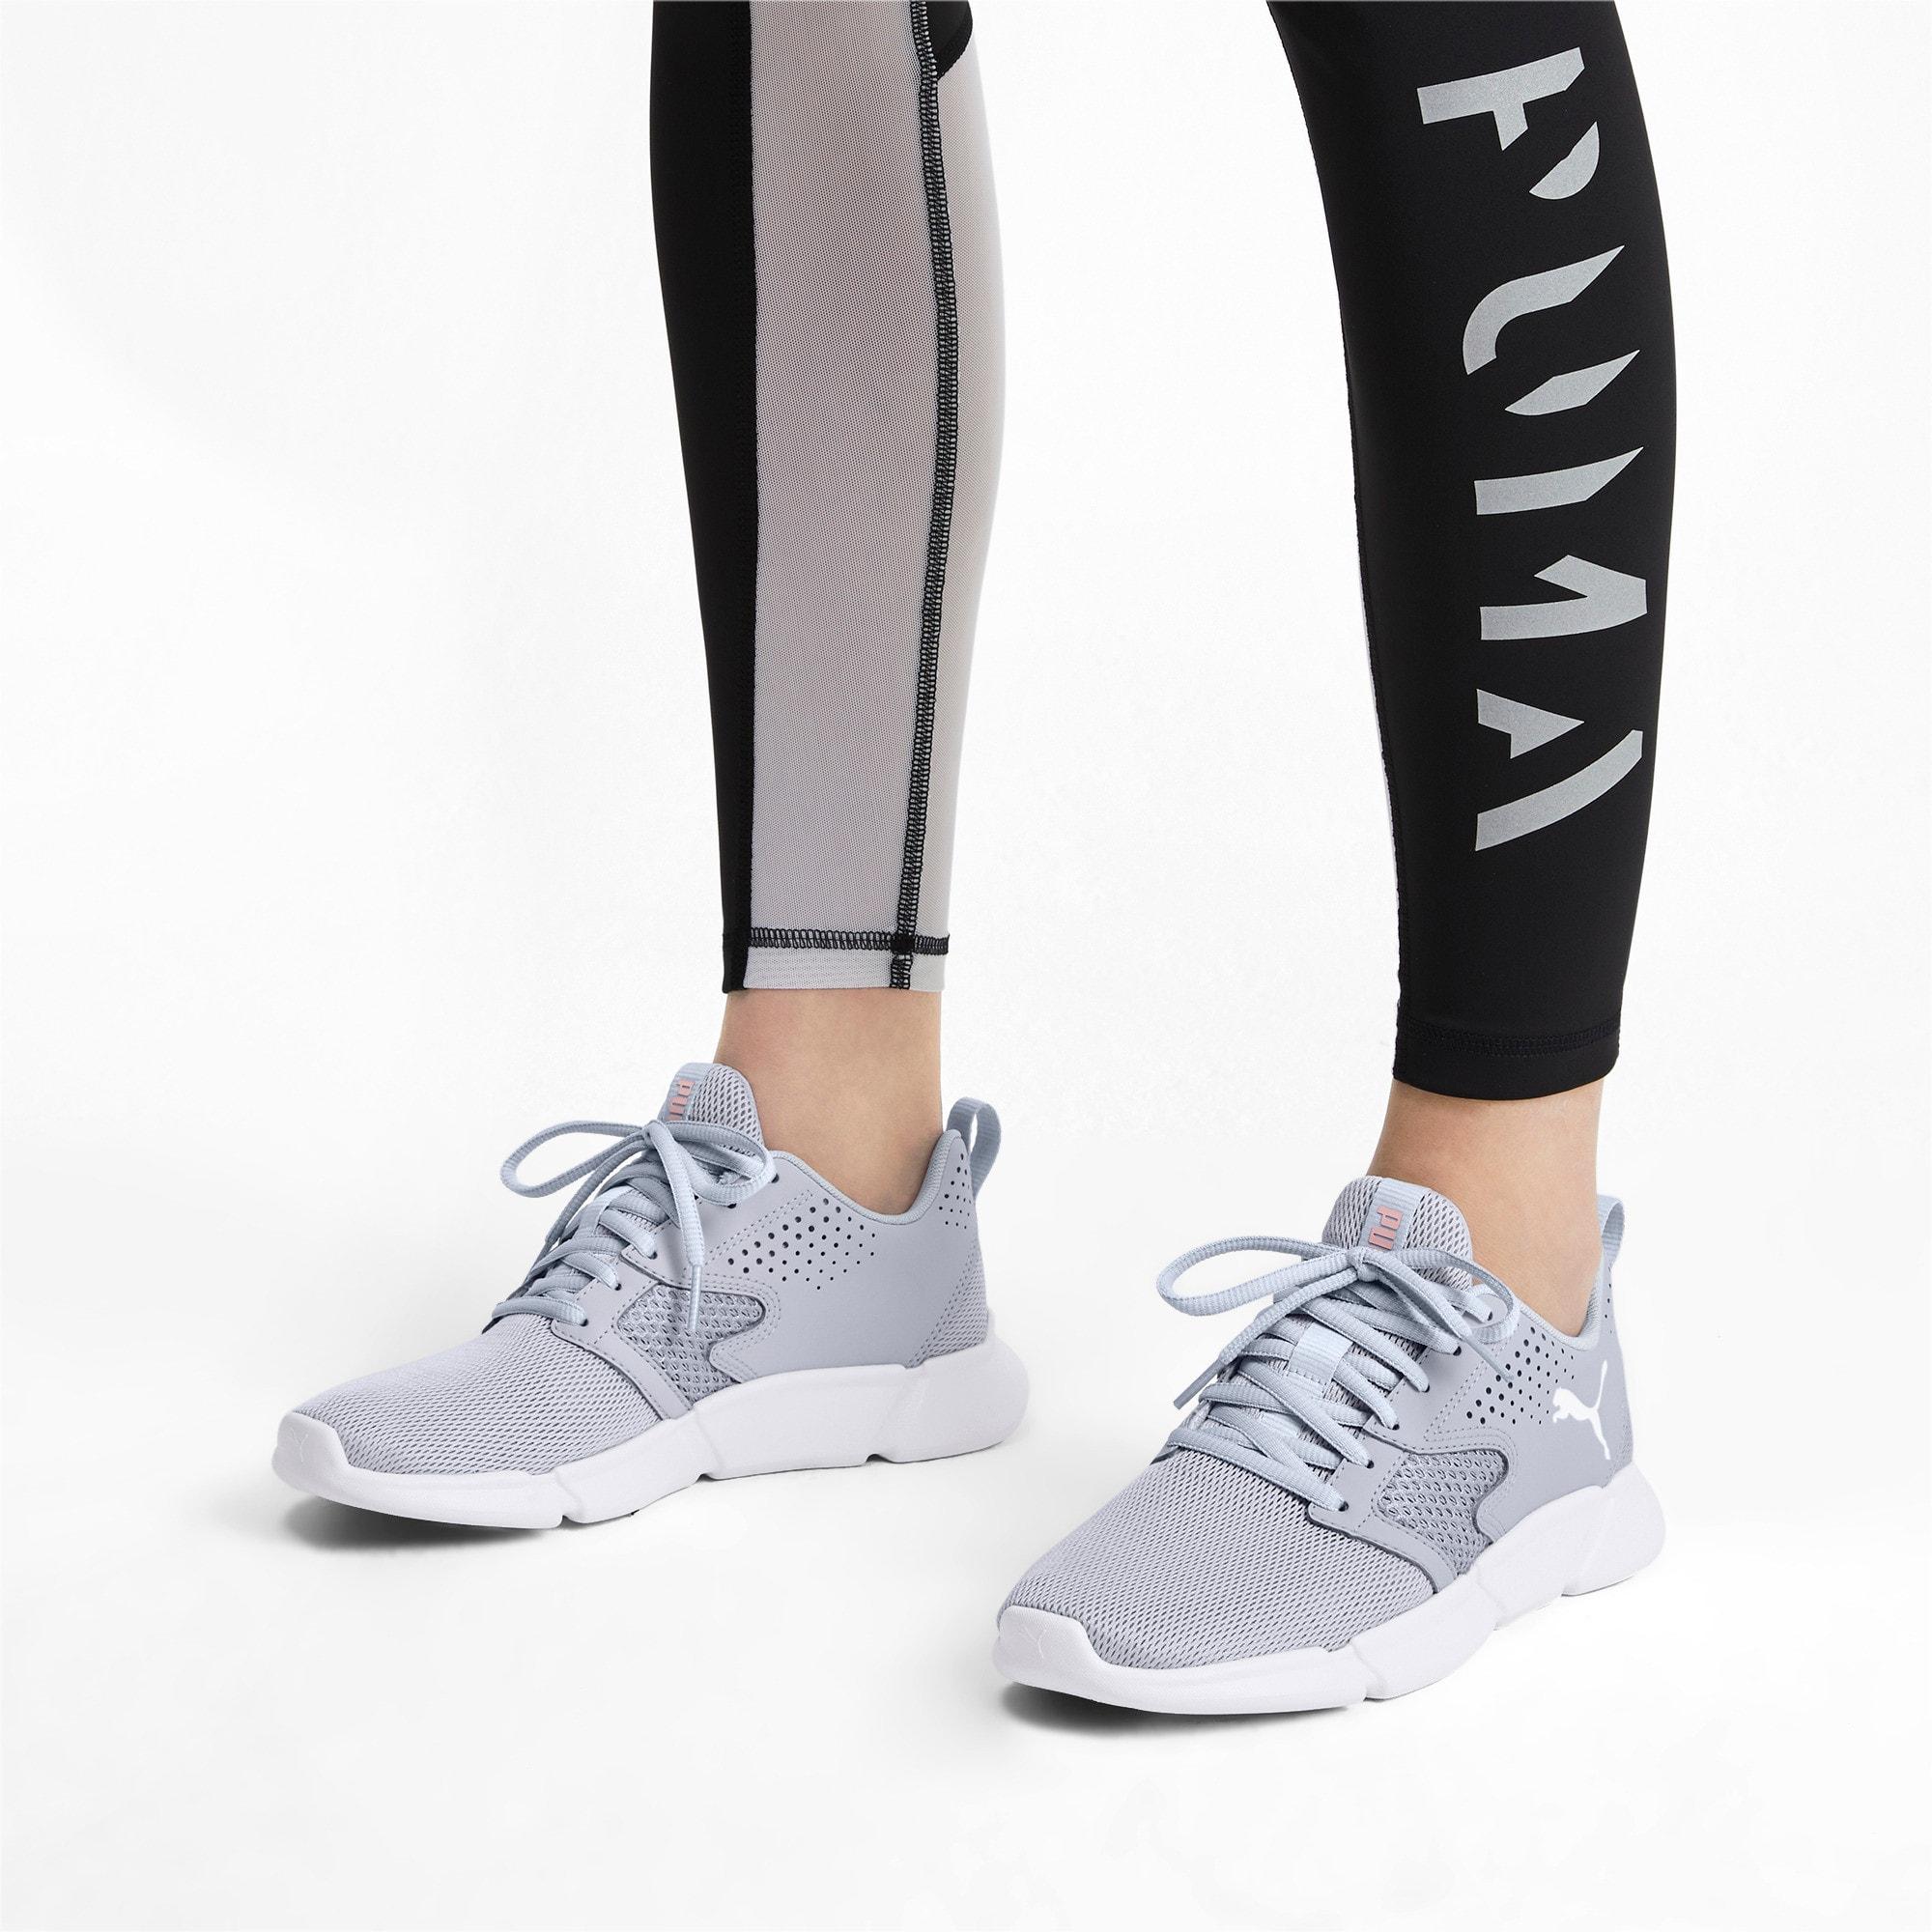 Thumbnail 2 of INTERFLEX Modern Running Shoes, Grey Dawn-Bridal Rose, medium-IND